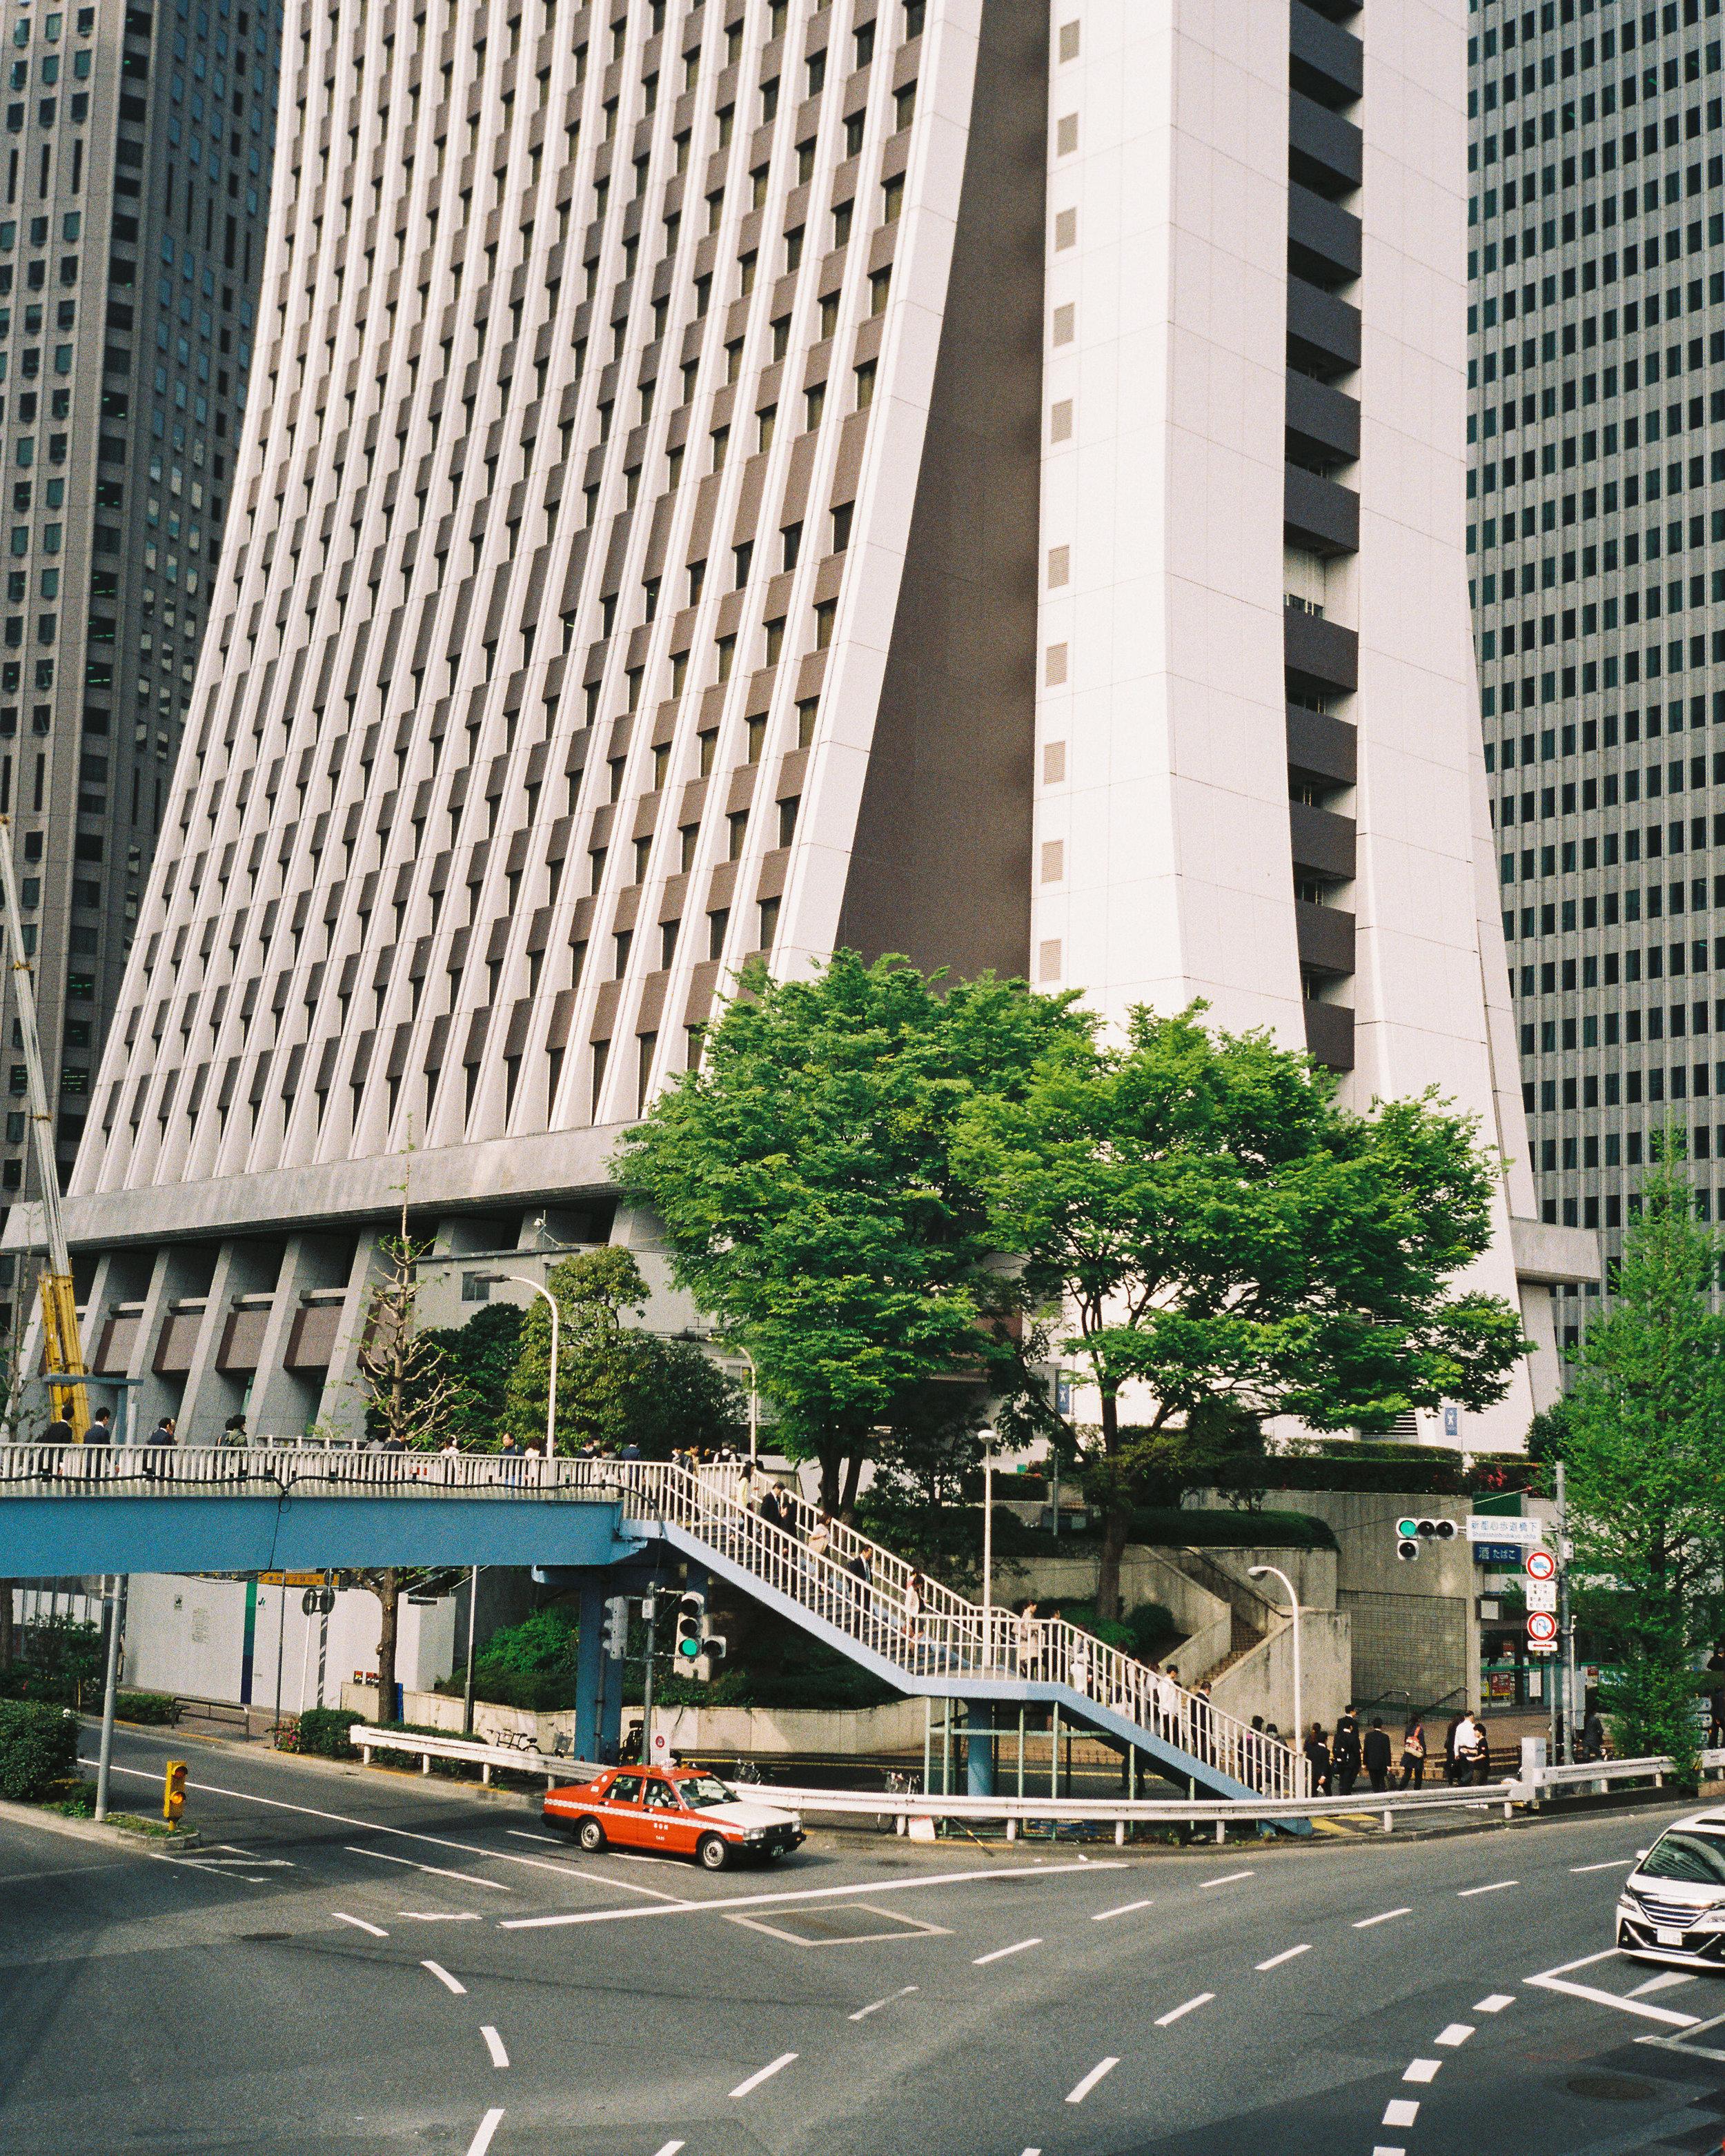 tokyo - april 2018